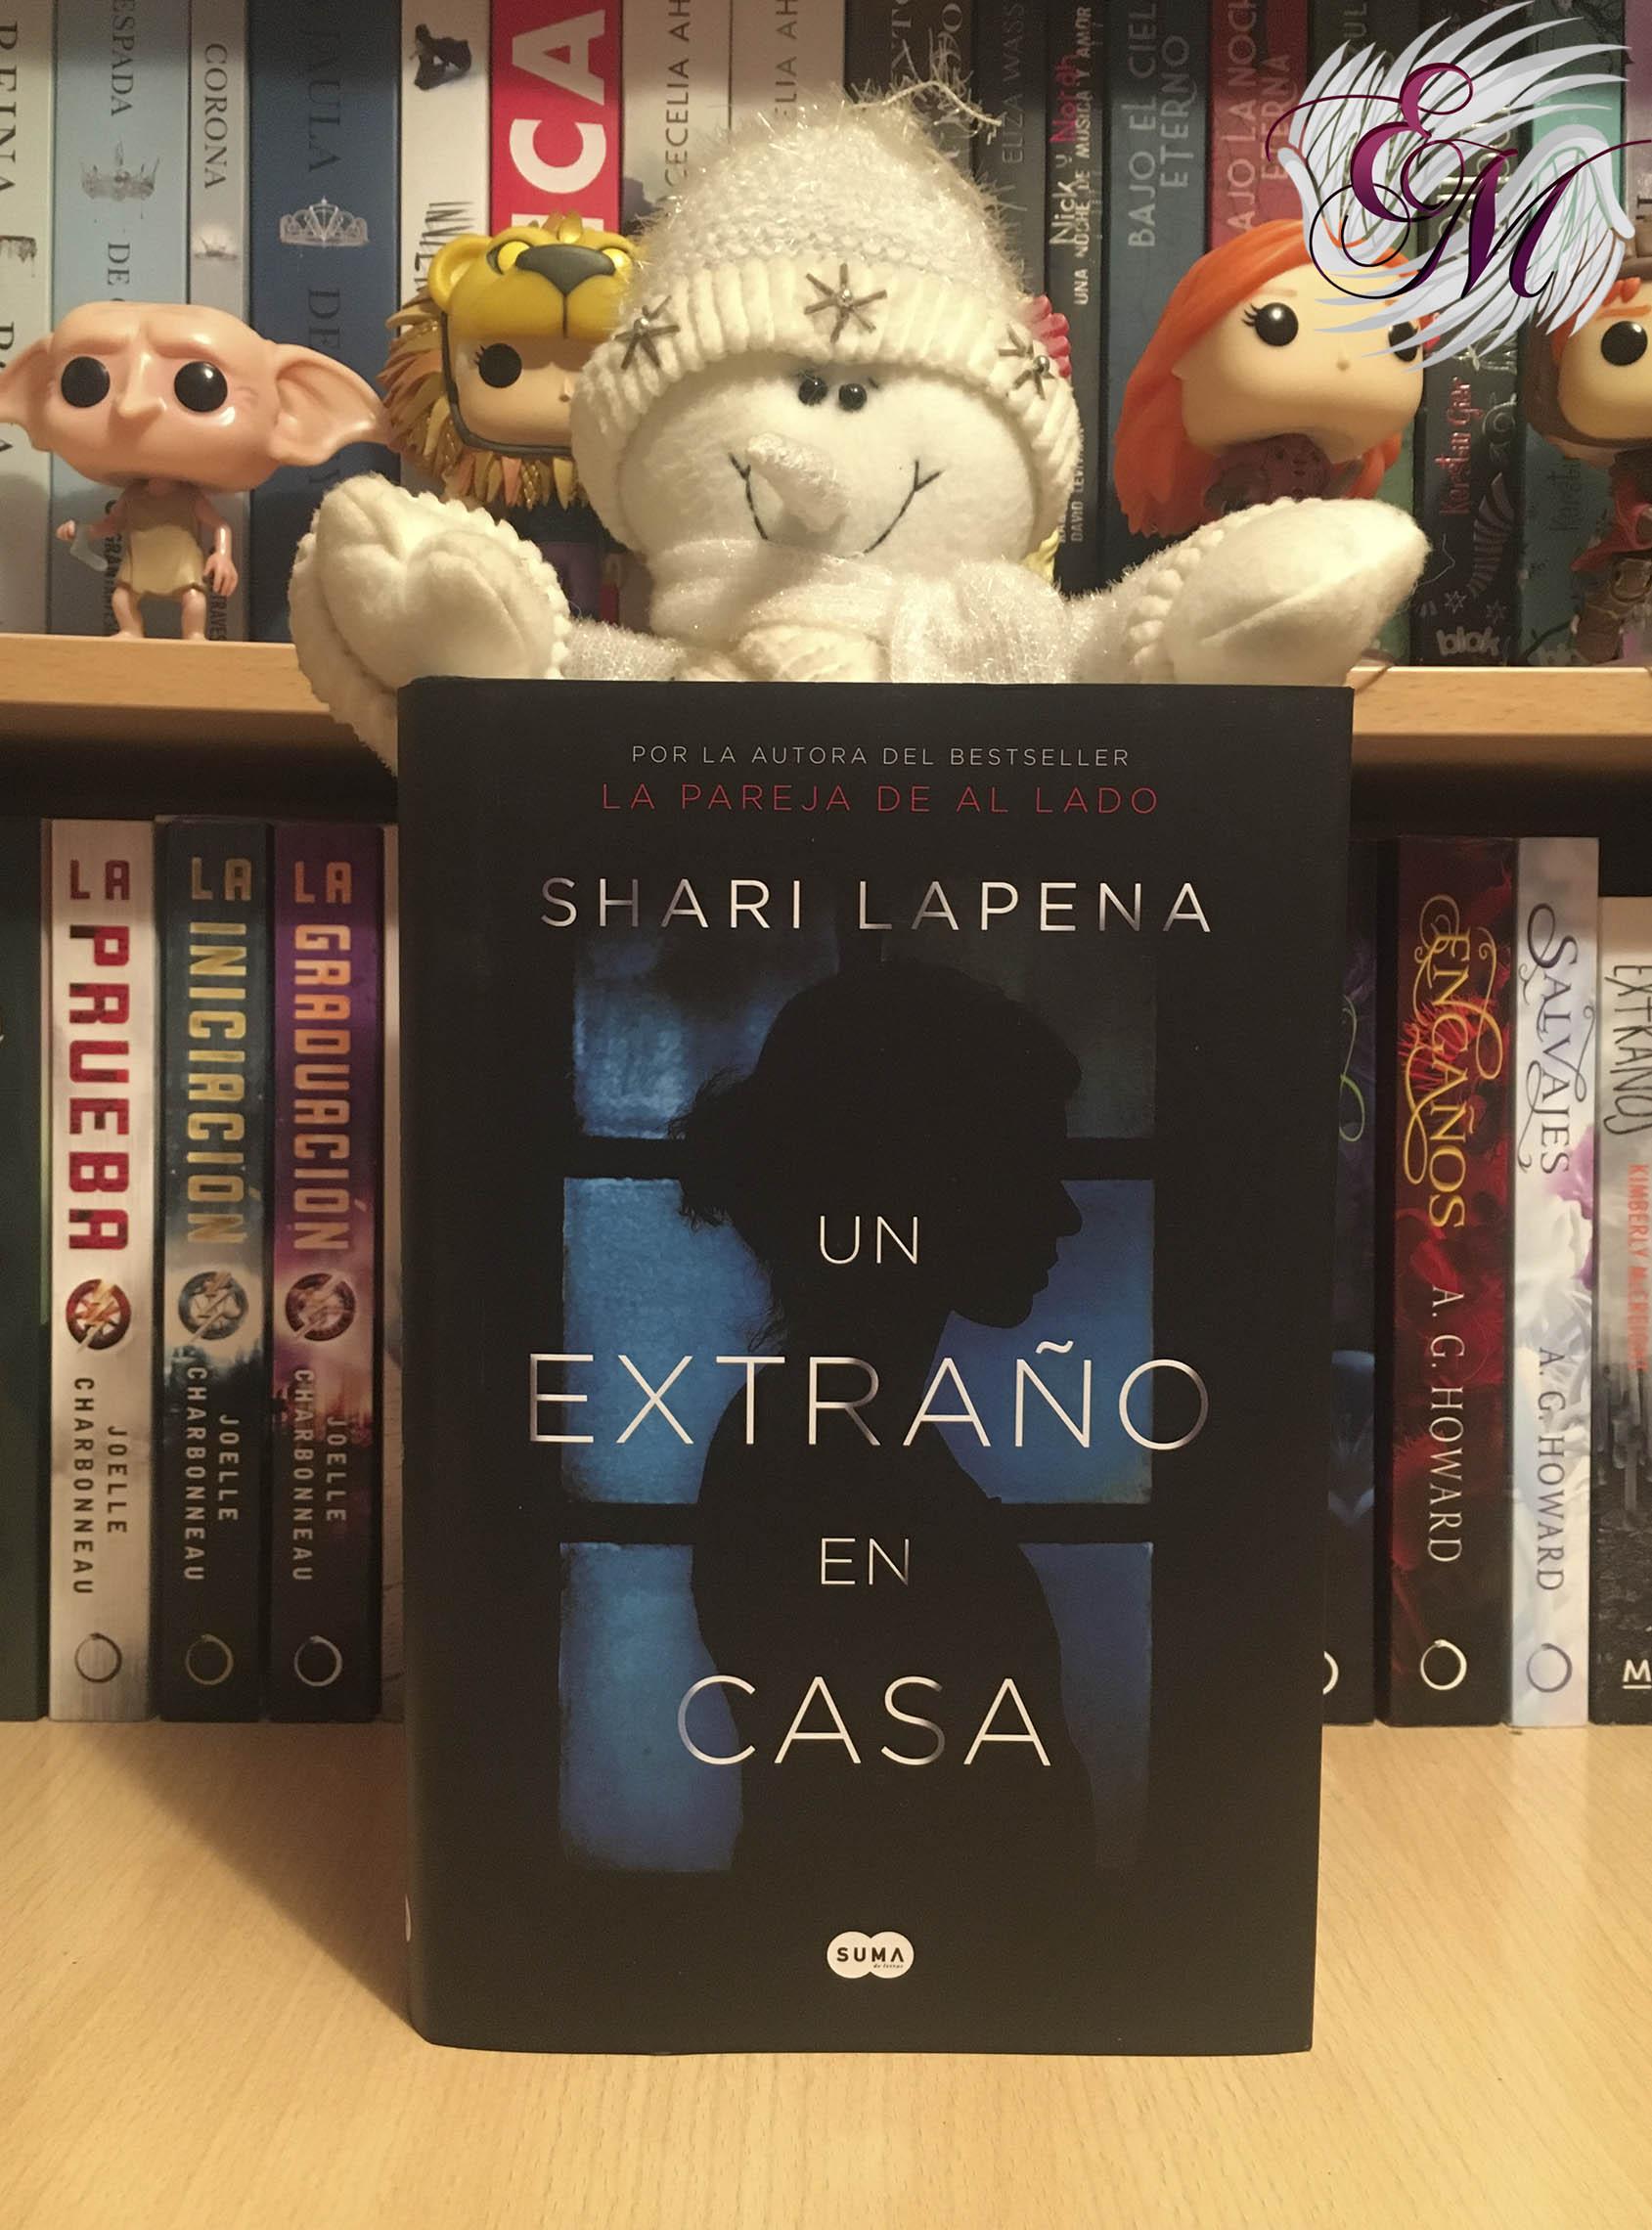 Un extraño en casa, de Shari Lapena - Reseña